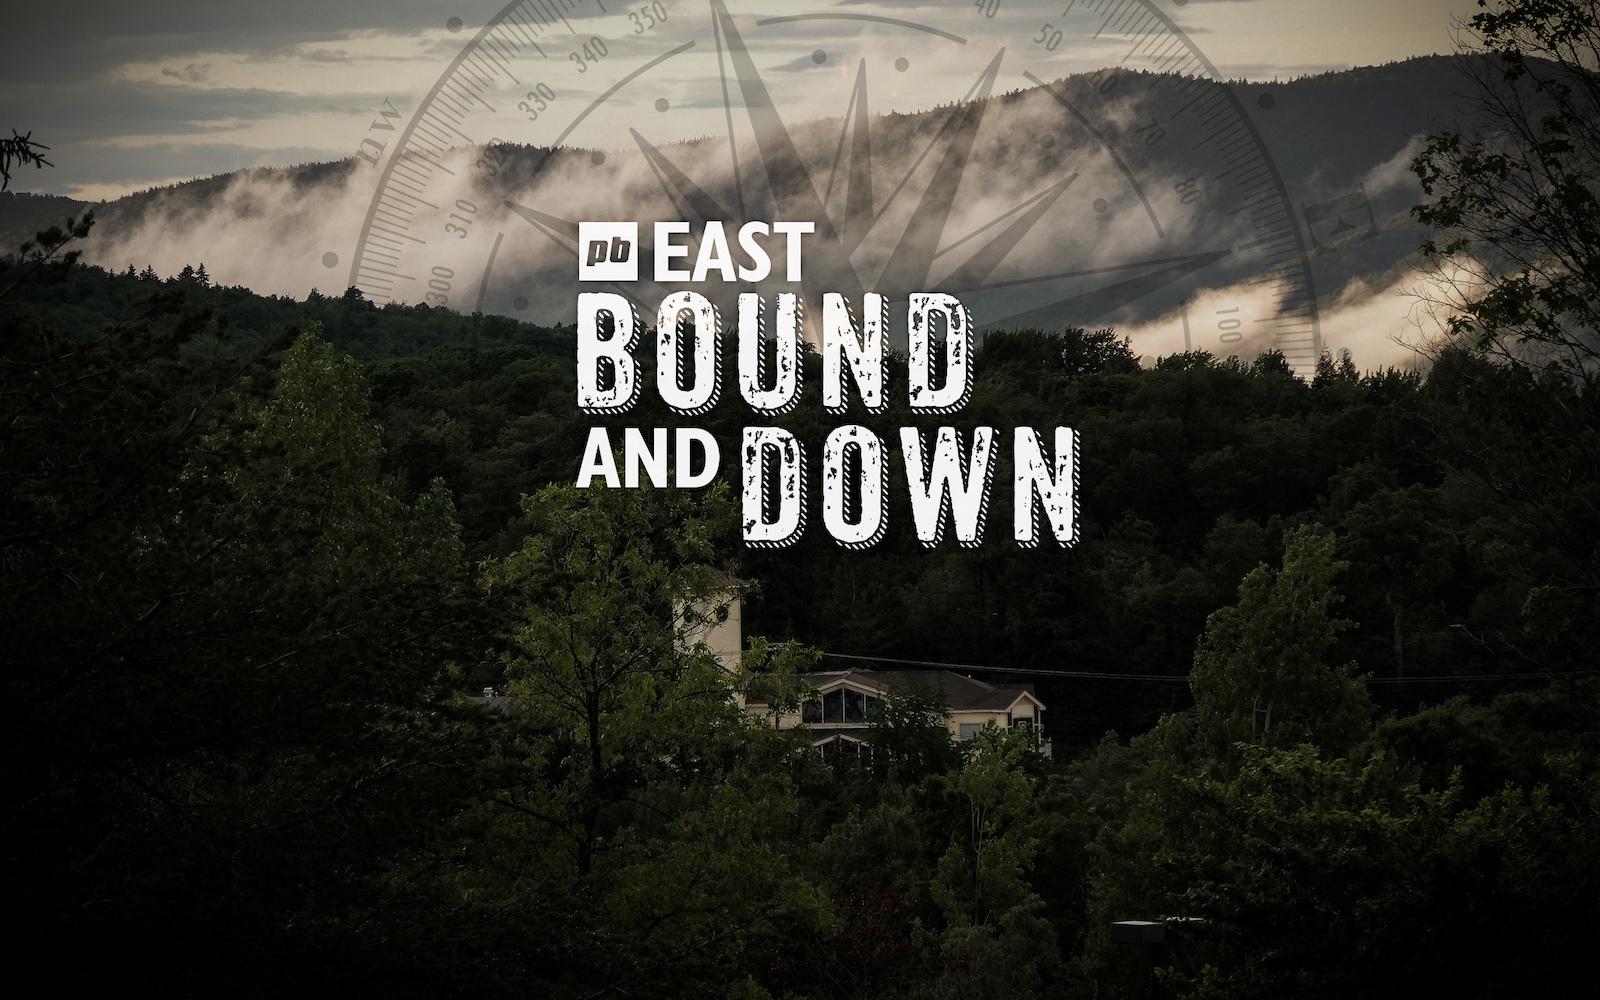 East Bound and Down Killington Vermont